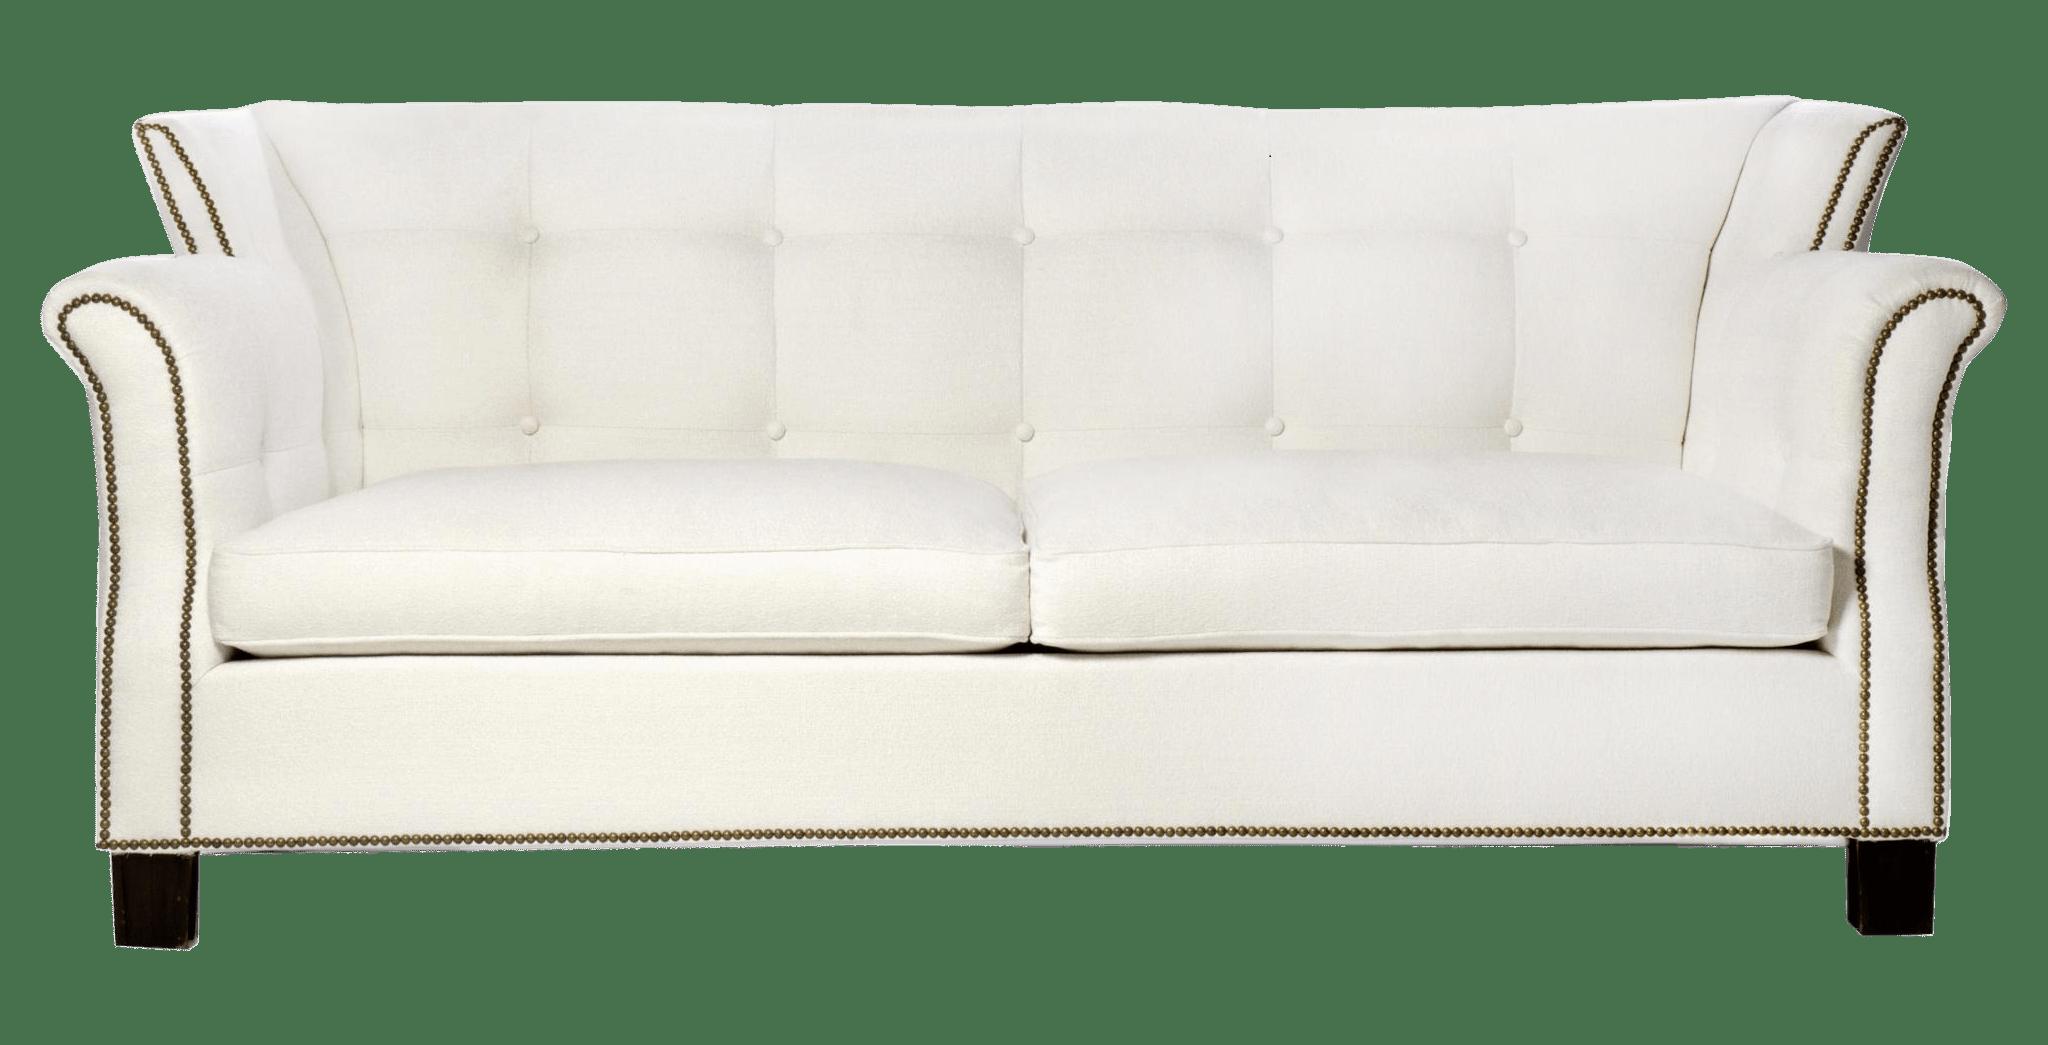 clic design sofa sears ca reclining designer outlet modern set designs in kenya